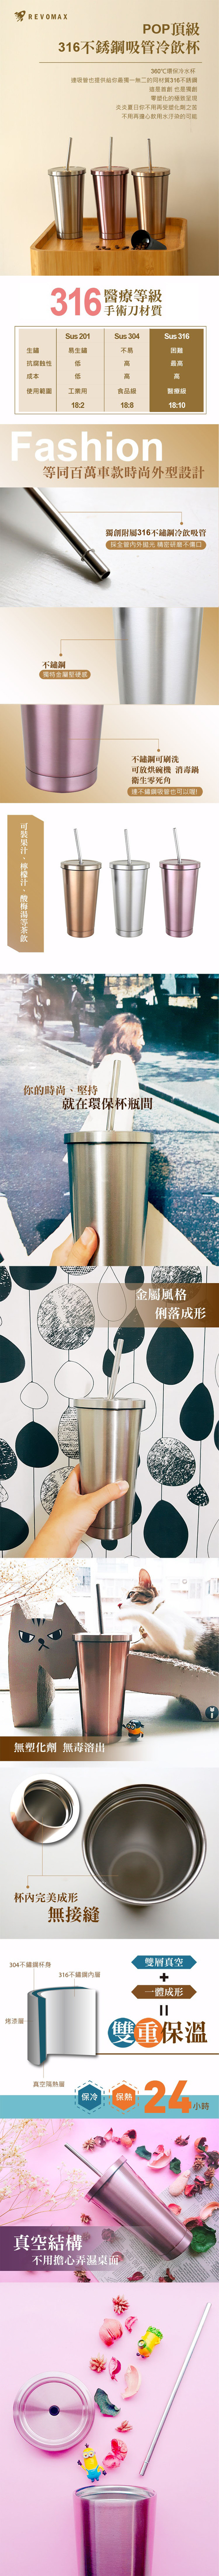 REVOMAX POP頂級316不鏽鋼吸管冷熱飲杯500ML(3色可選)